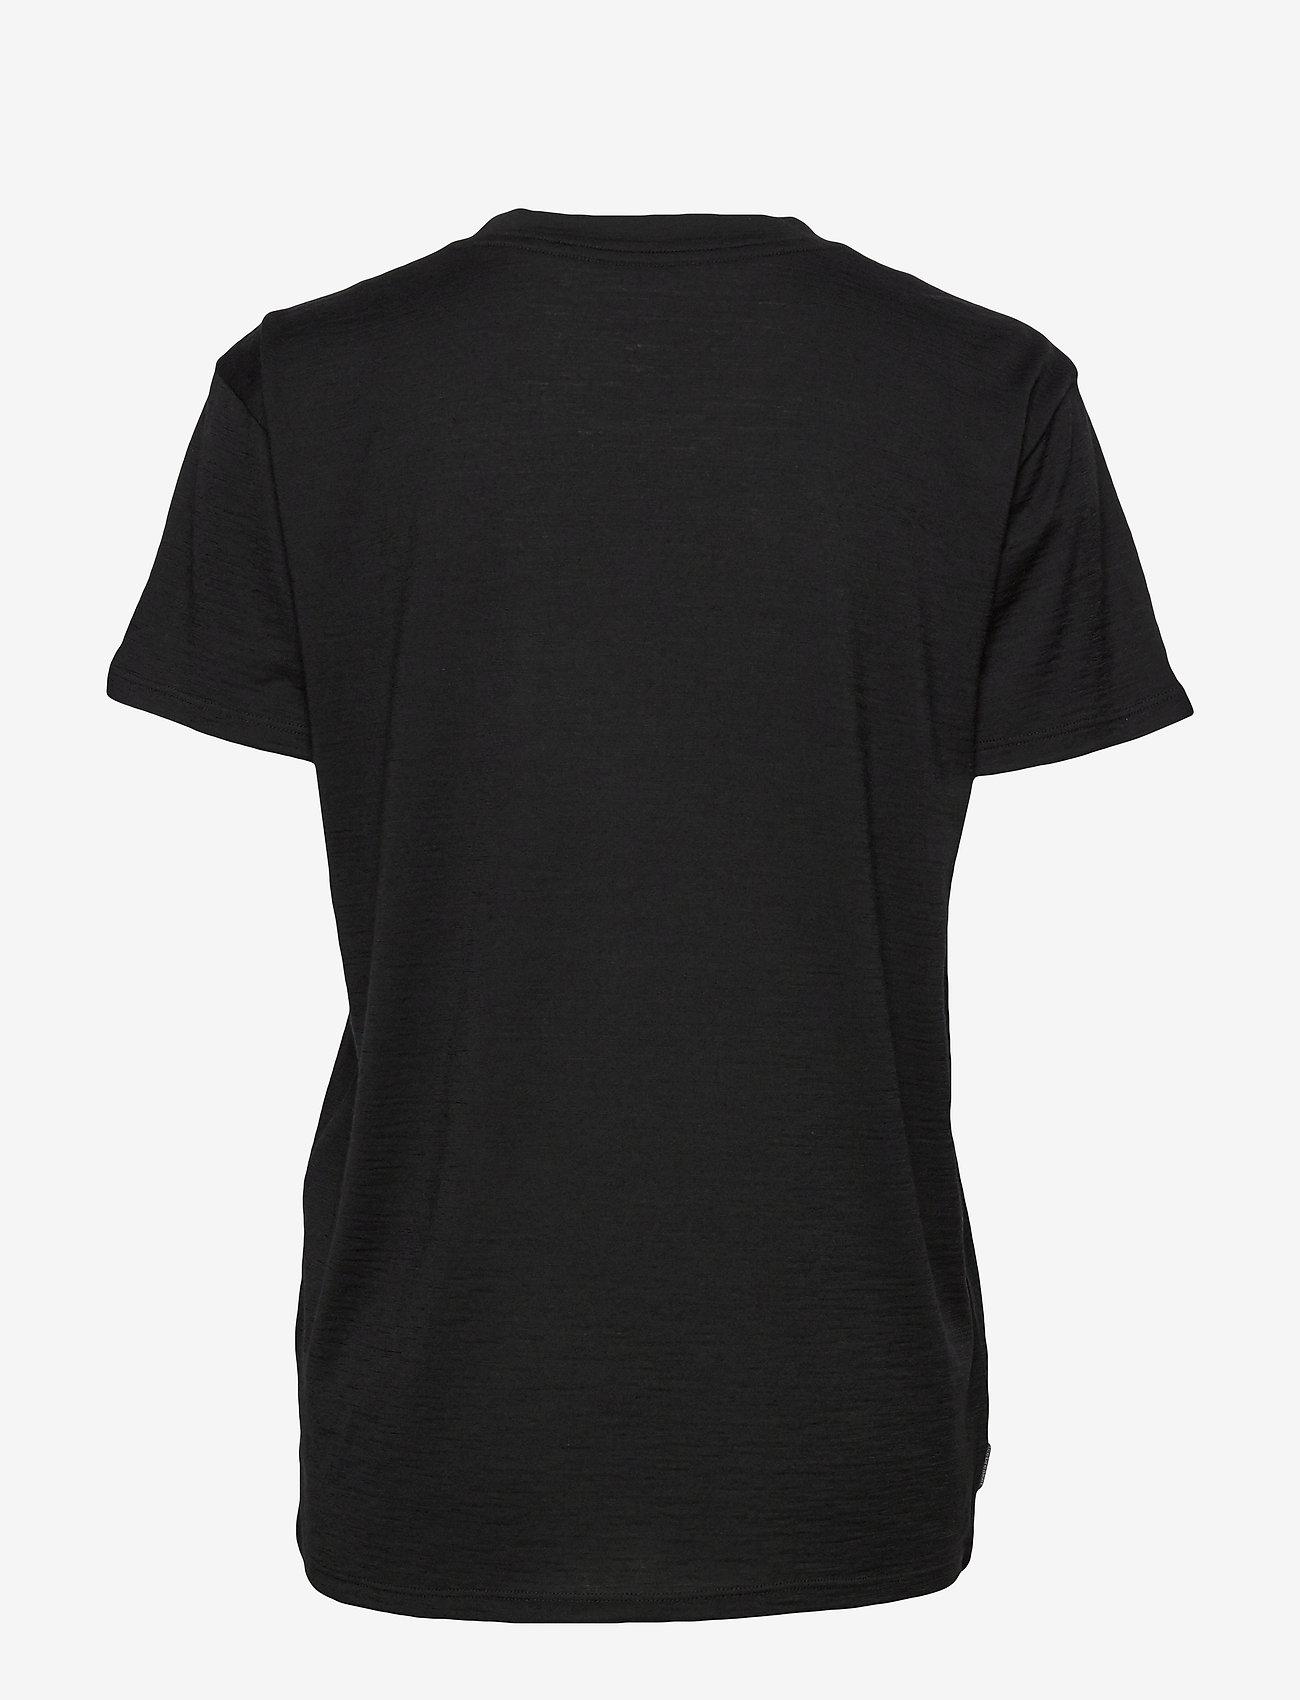 Icebreaker - Wmns Tech Lite SS Scoop Solo - t-shirts med tryck - black - 1